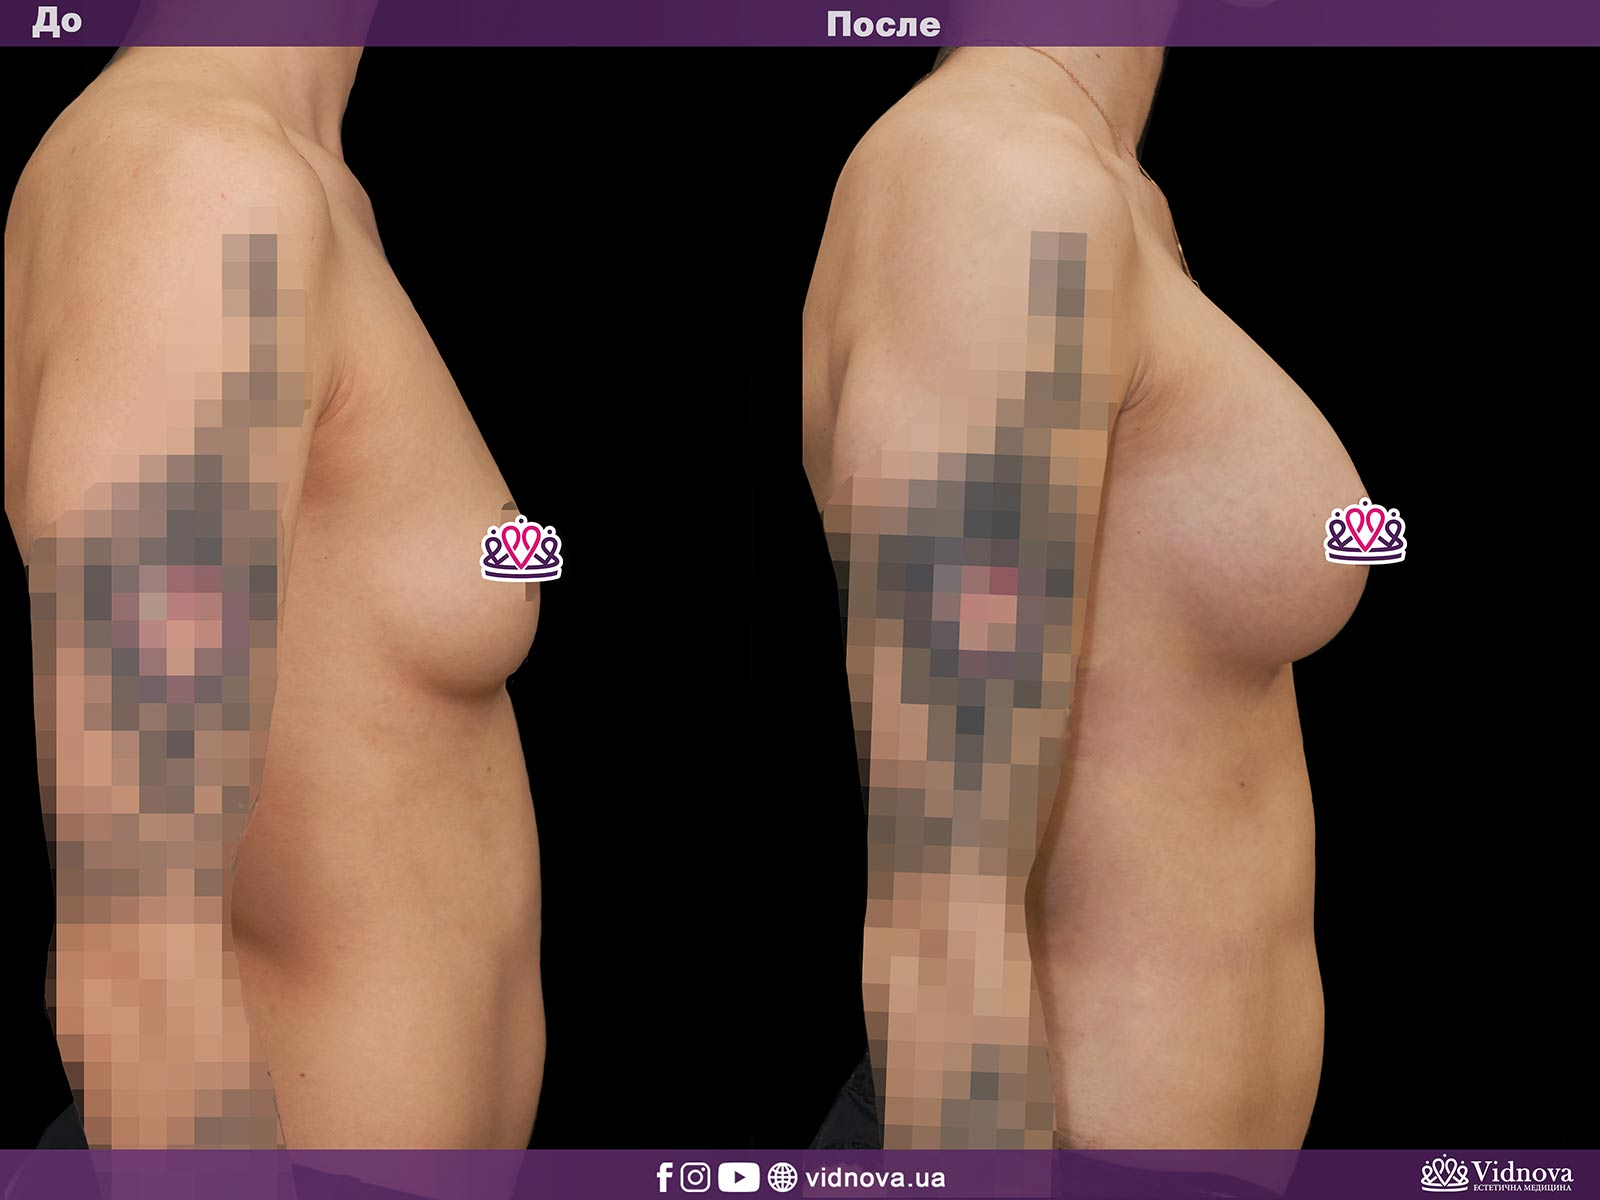 Увеличение груди: Фото ДО и ПОСЛЕ - Пример №1-3 - Клиника Vidnova